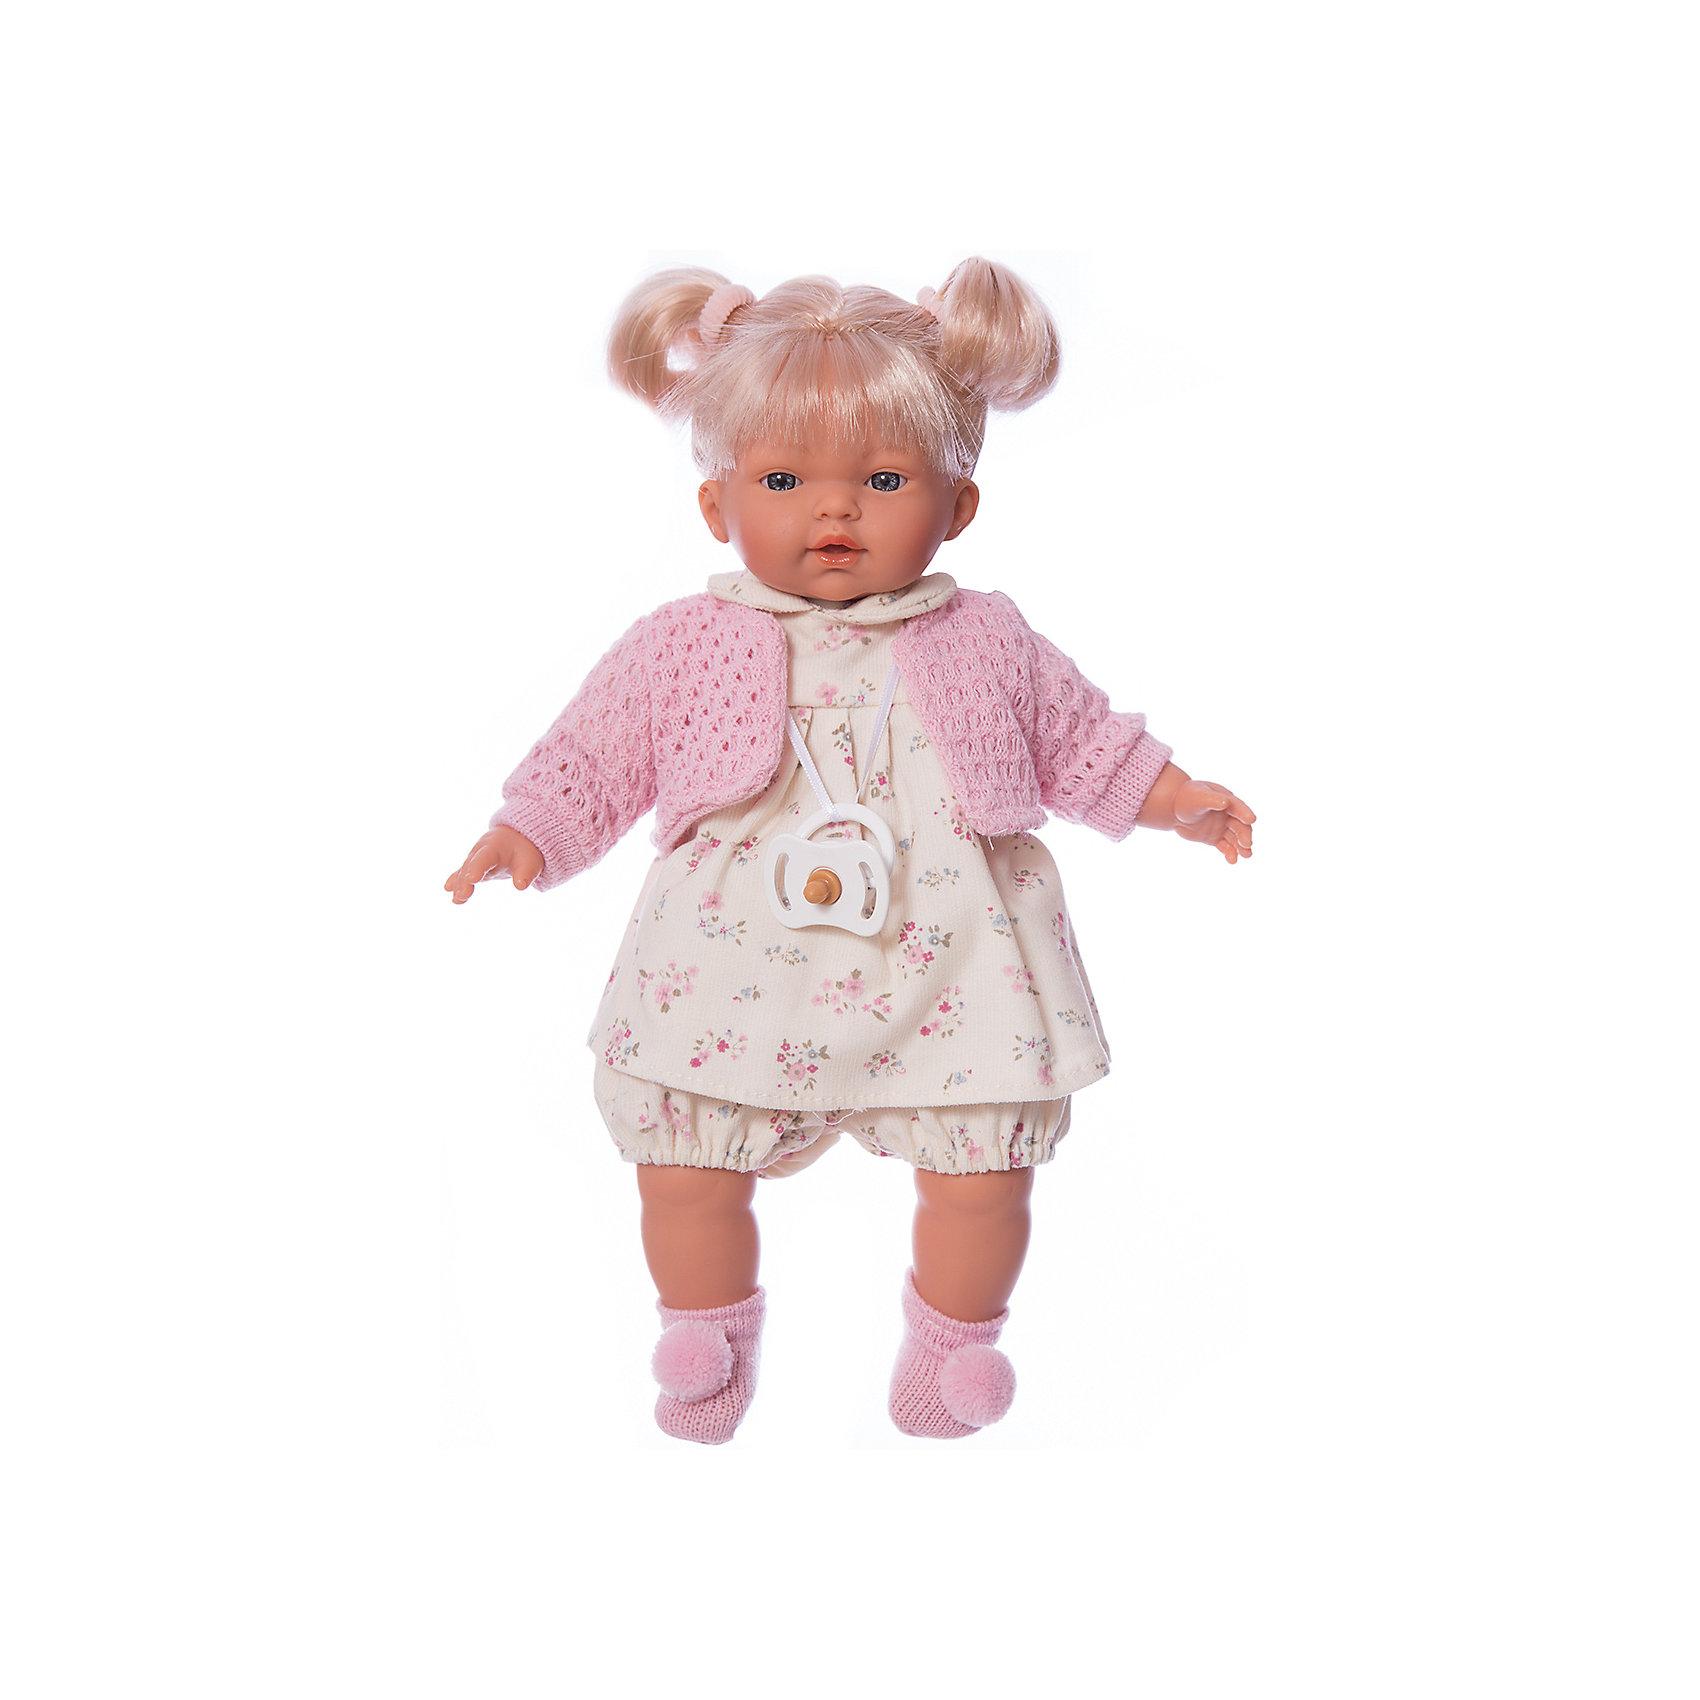 Llorens Кукла Ариана, 33 см, Llorens куклы и одежда для кукол llorens кукла изабела 33 см со звуком